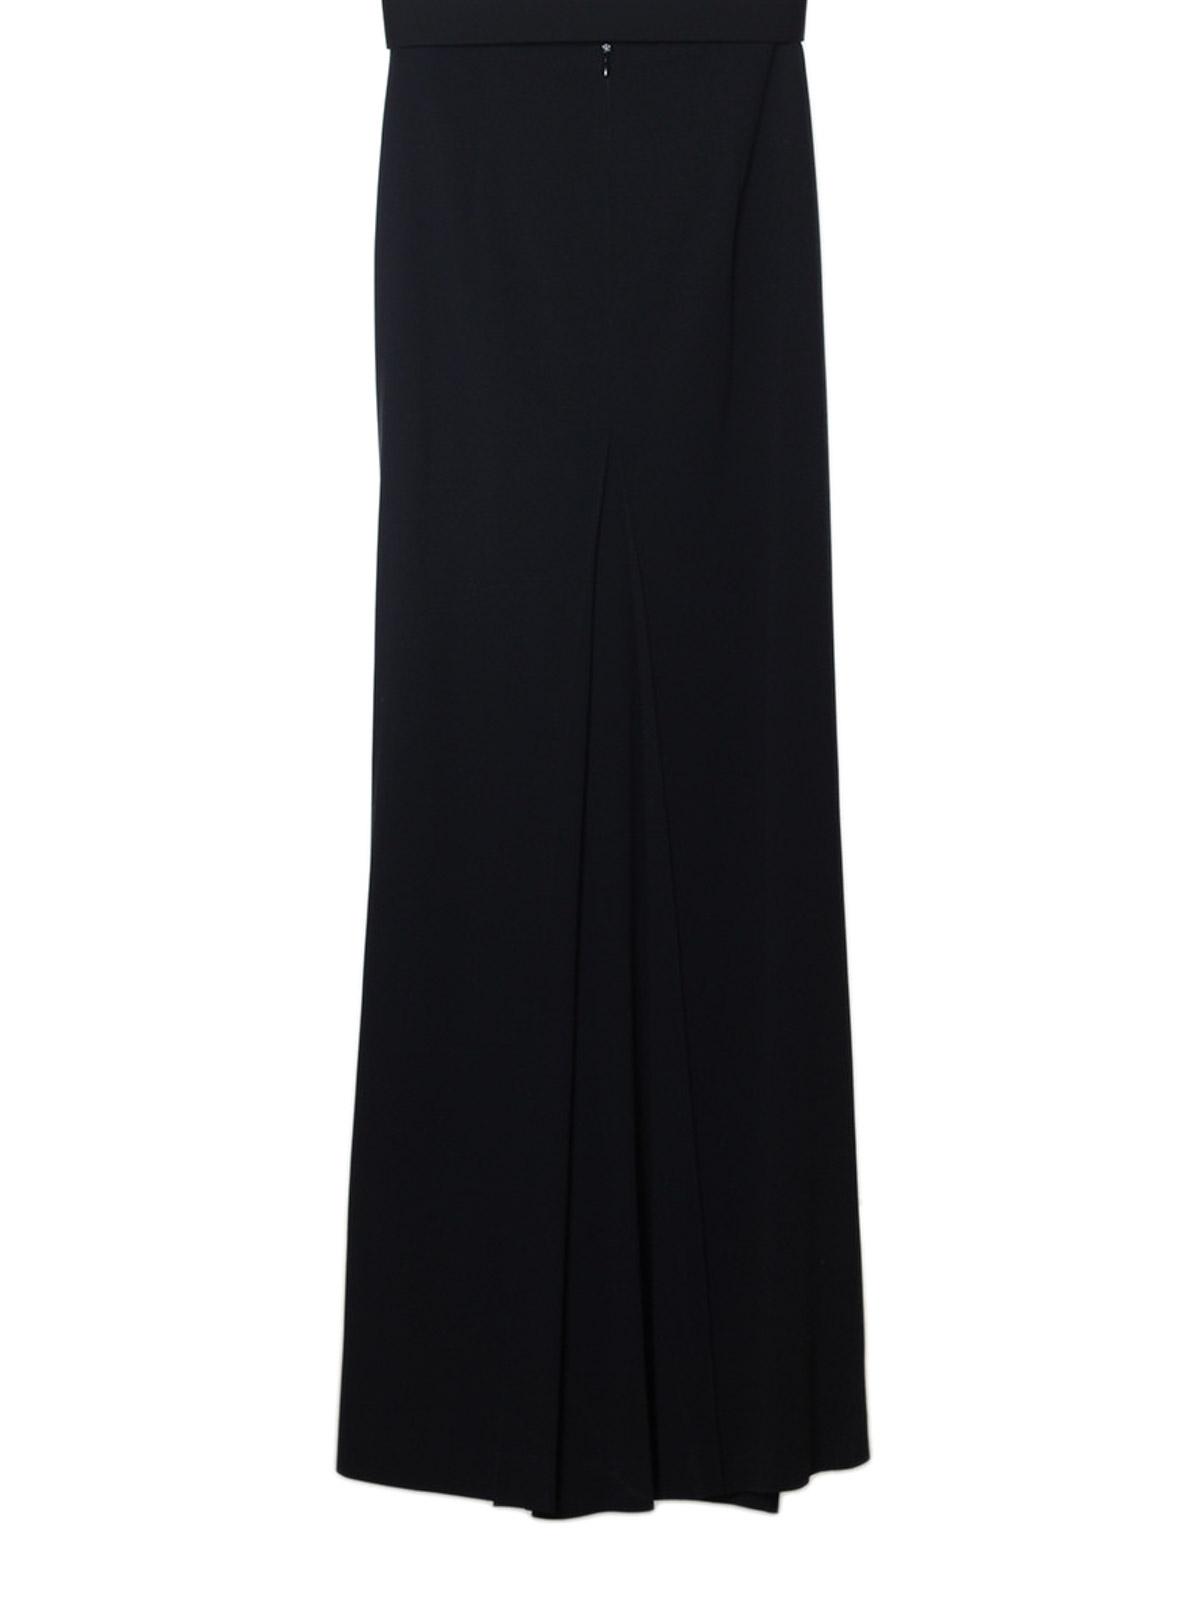 skirts fashionsizzle length fall floor floors trends